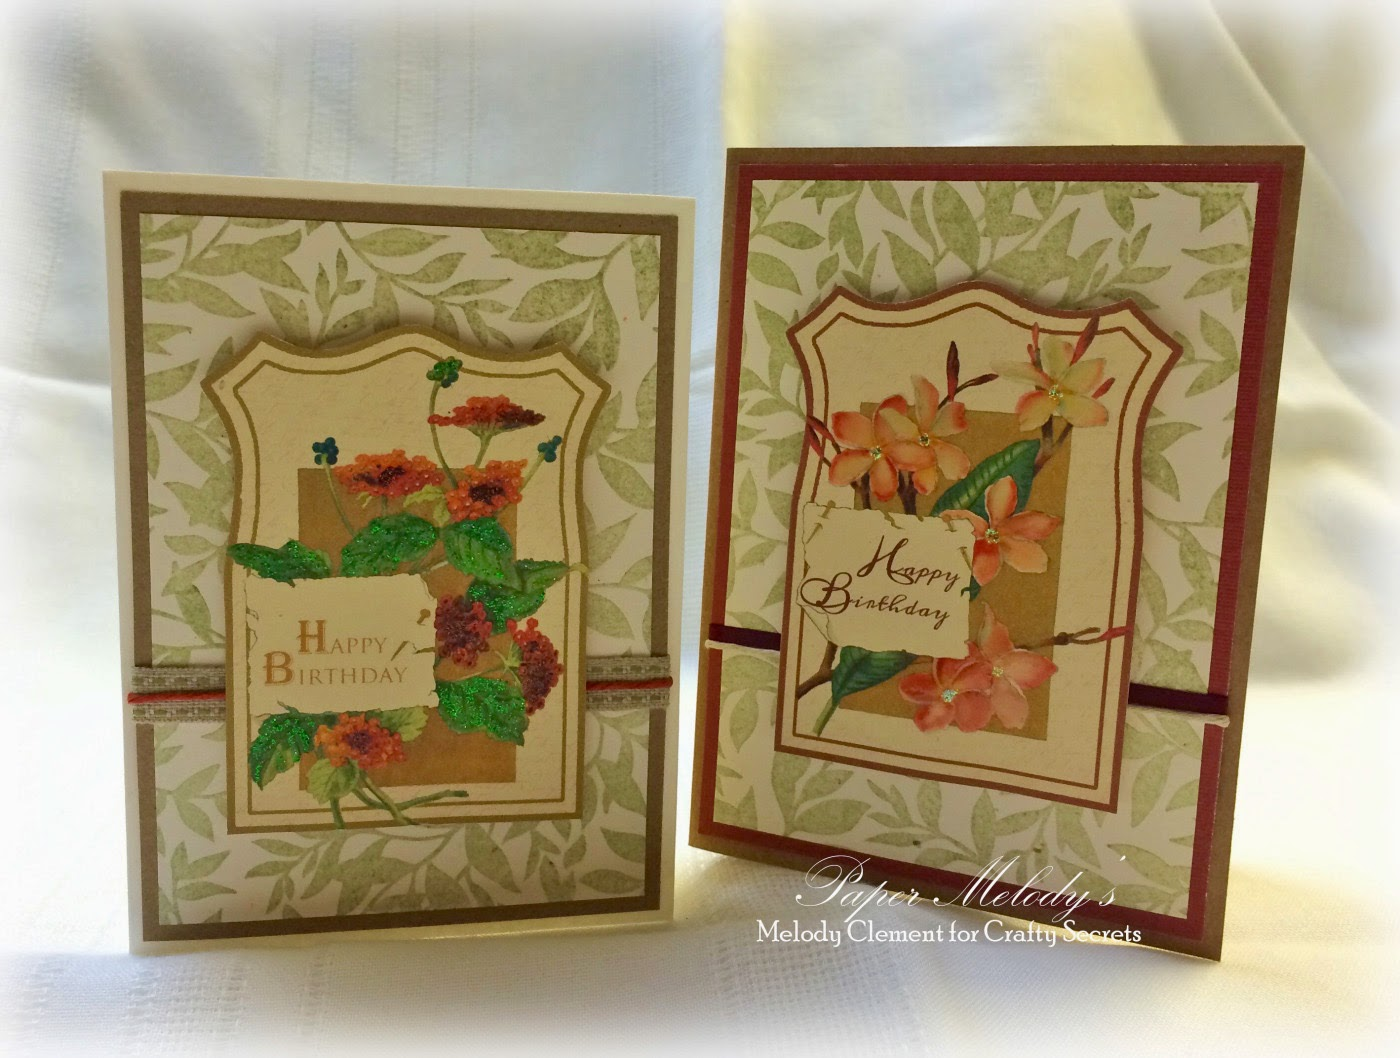 http://2.bp.blogspot.com/-B1a7BN0sz3Q/VRVDLrqnaOI/AAAAAAAATHE/P-4MByGnbck/s1600/floral-birthday-1-Melody-CD-2.jpg